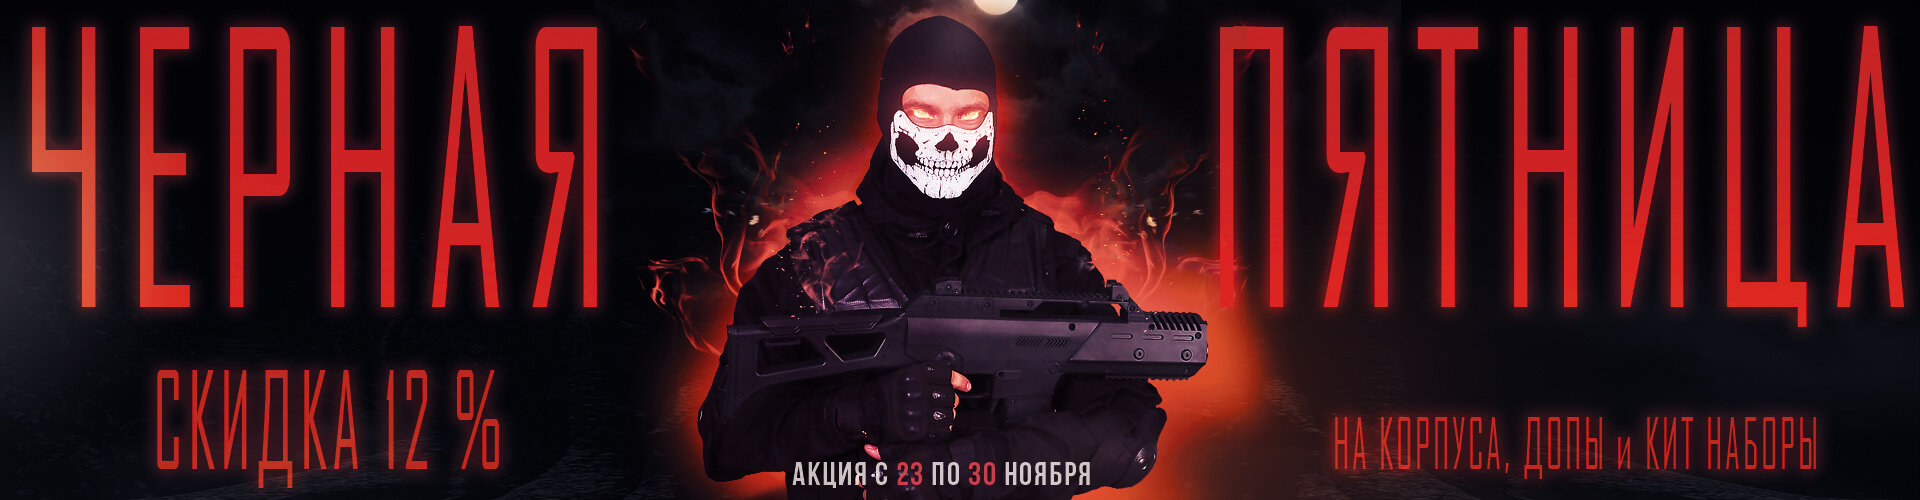 ЧЕРНАЯ ПЯТНИЦА_3